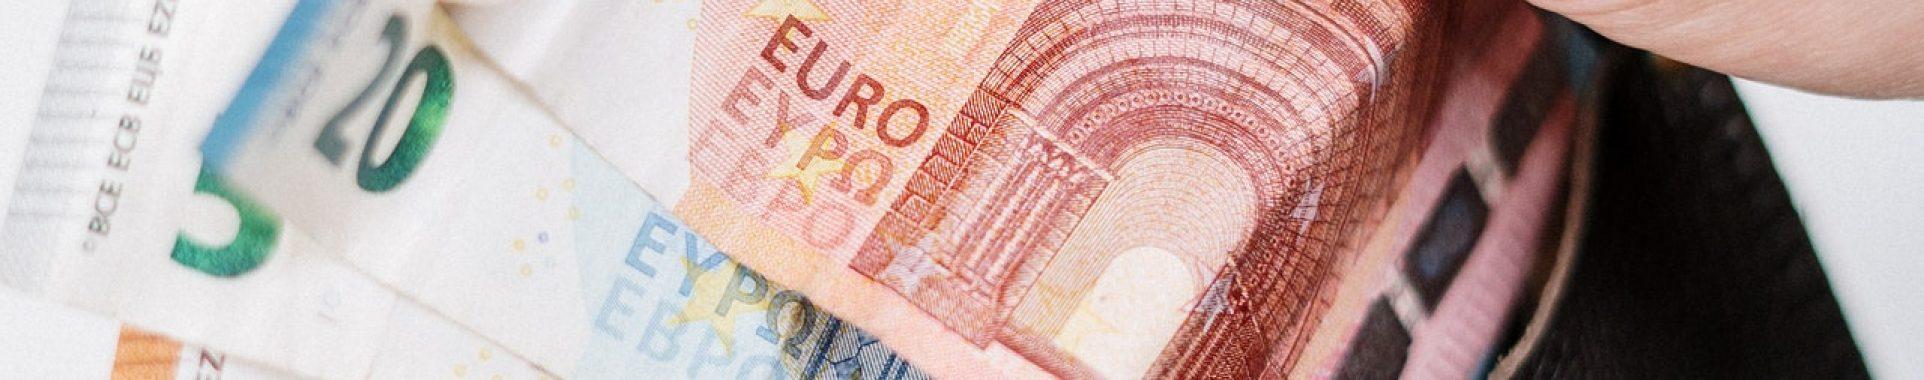 10-and-10-euro-banknotes-3943740